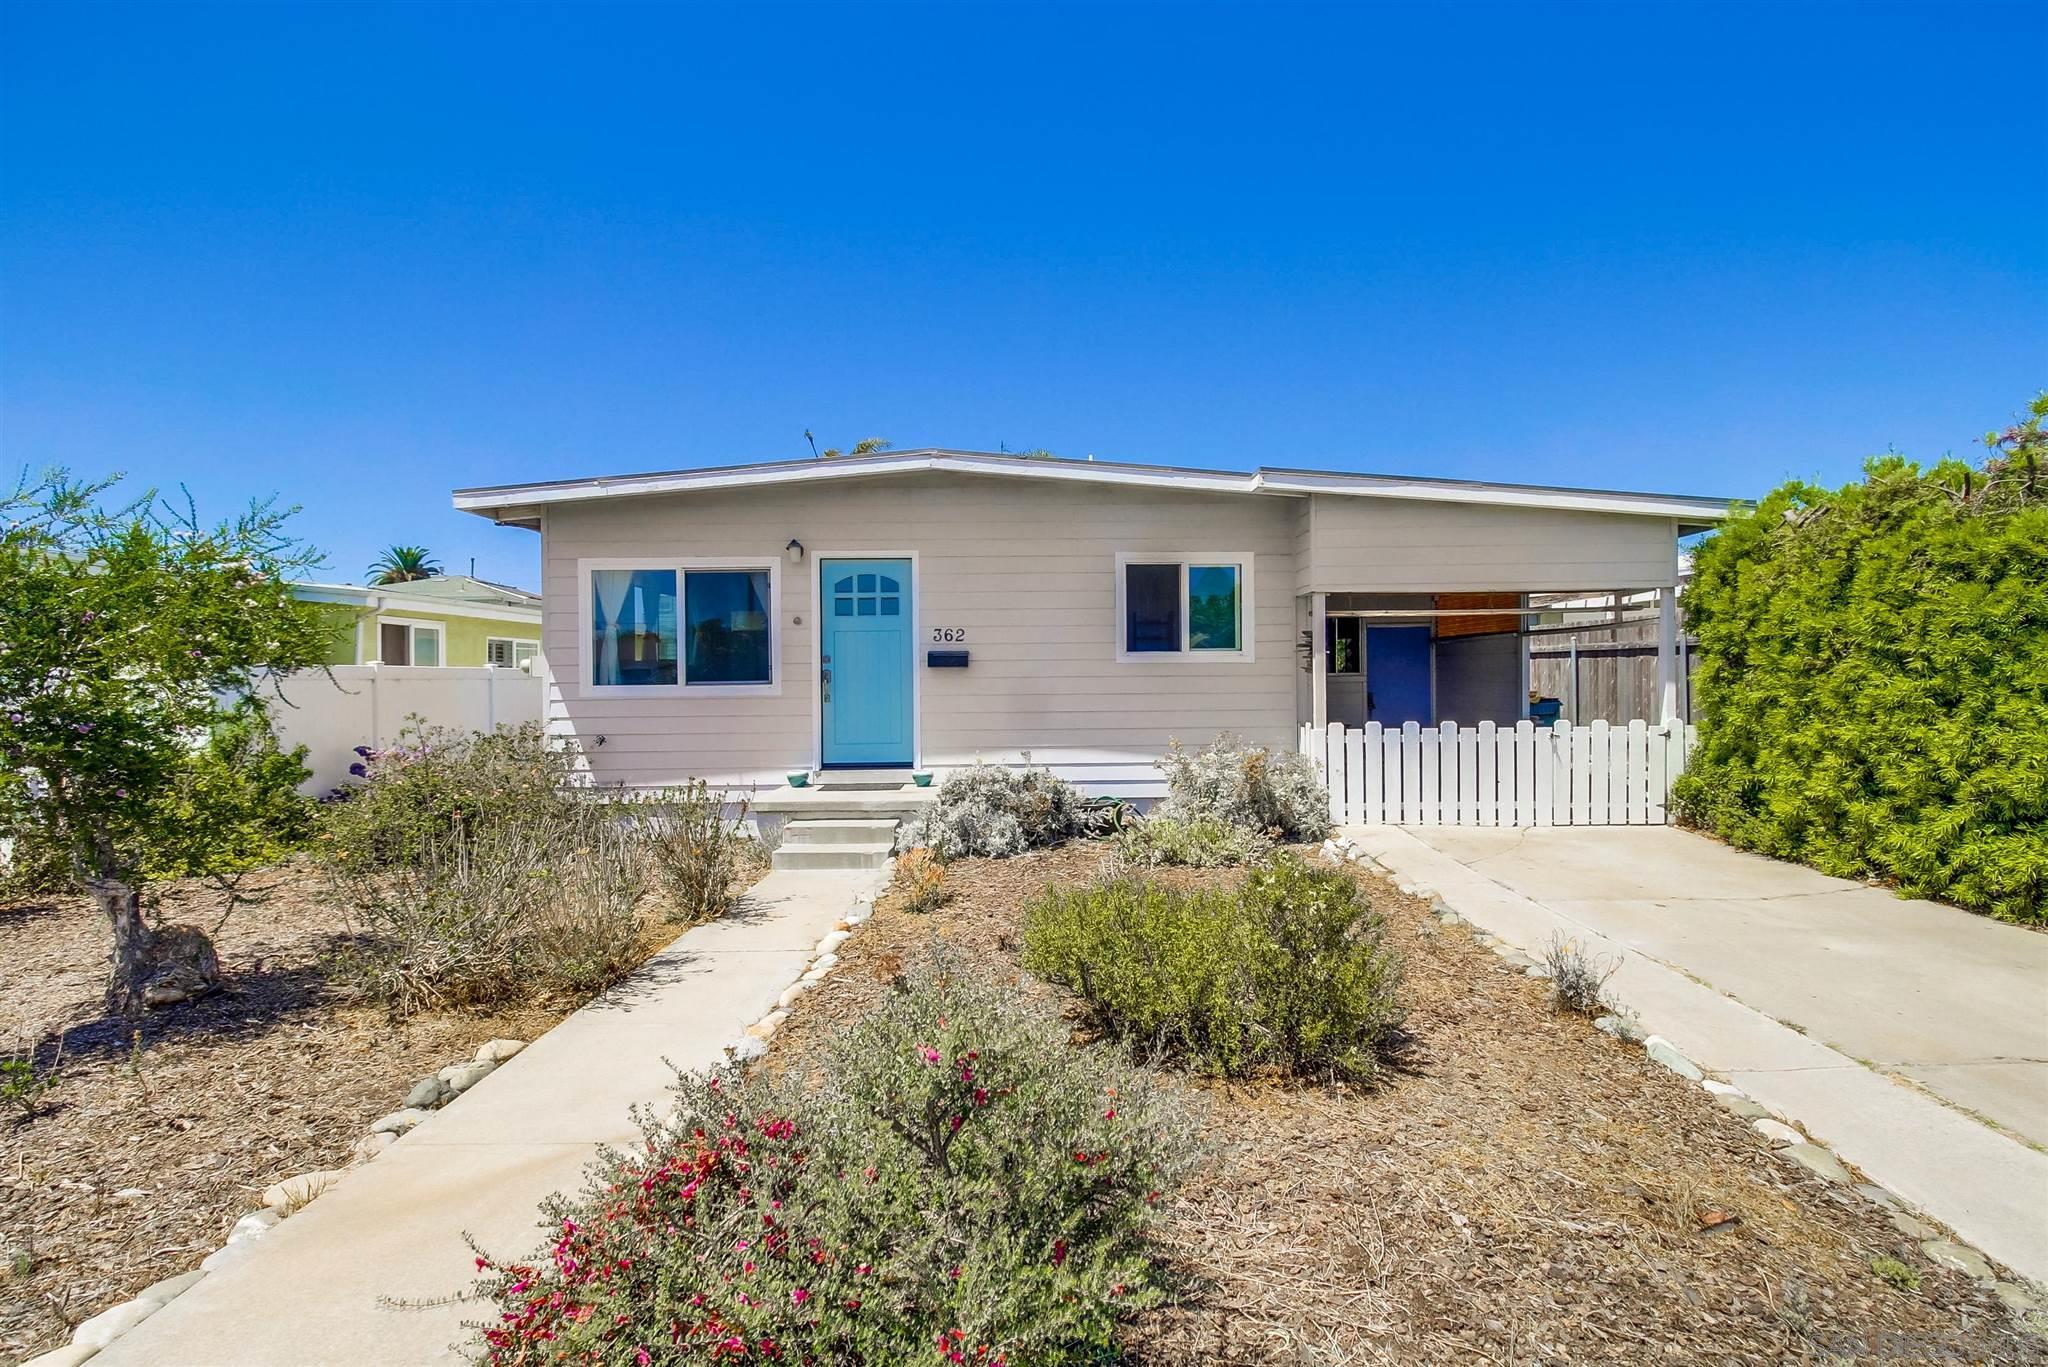 362 Elm Ave, Imperial Beach, CA 91932